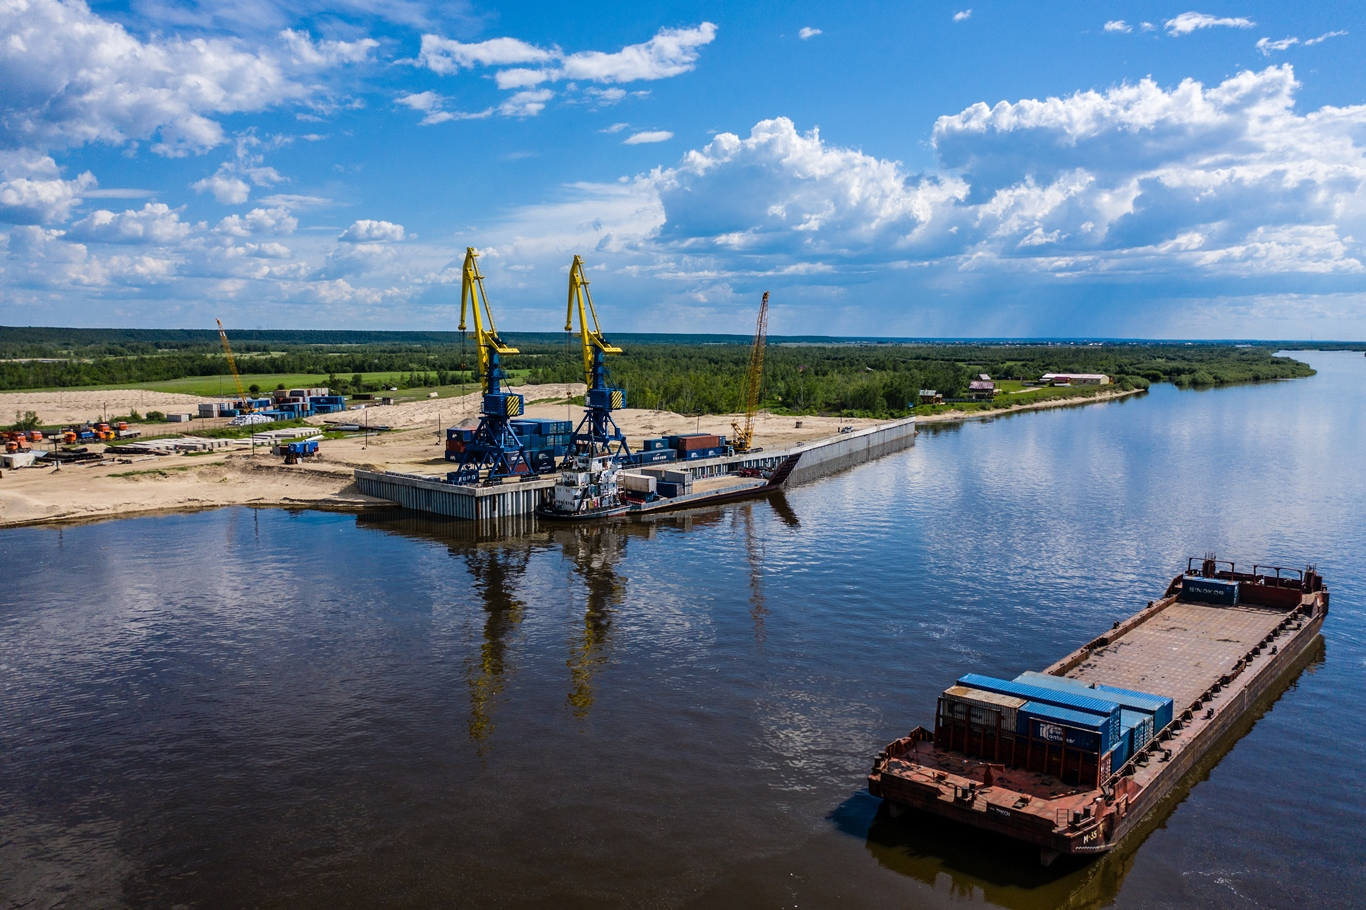 В Якутии в 2023 году построят терминал мощностью 2 млн. тонн грузов